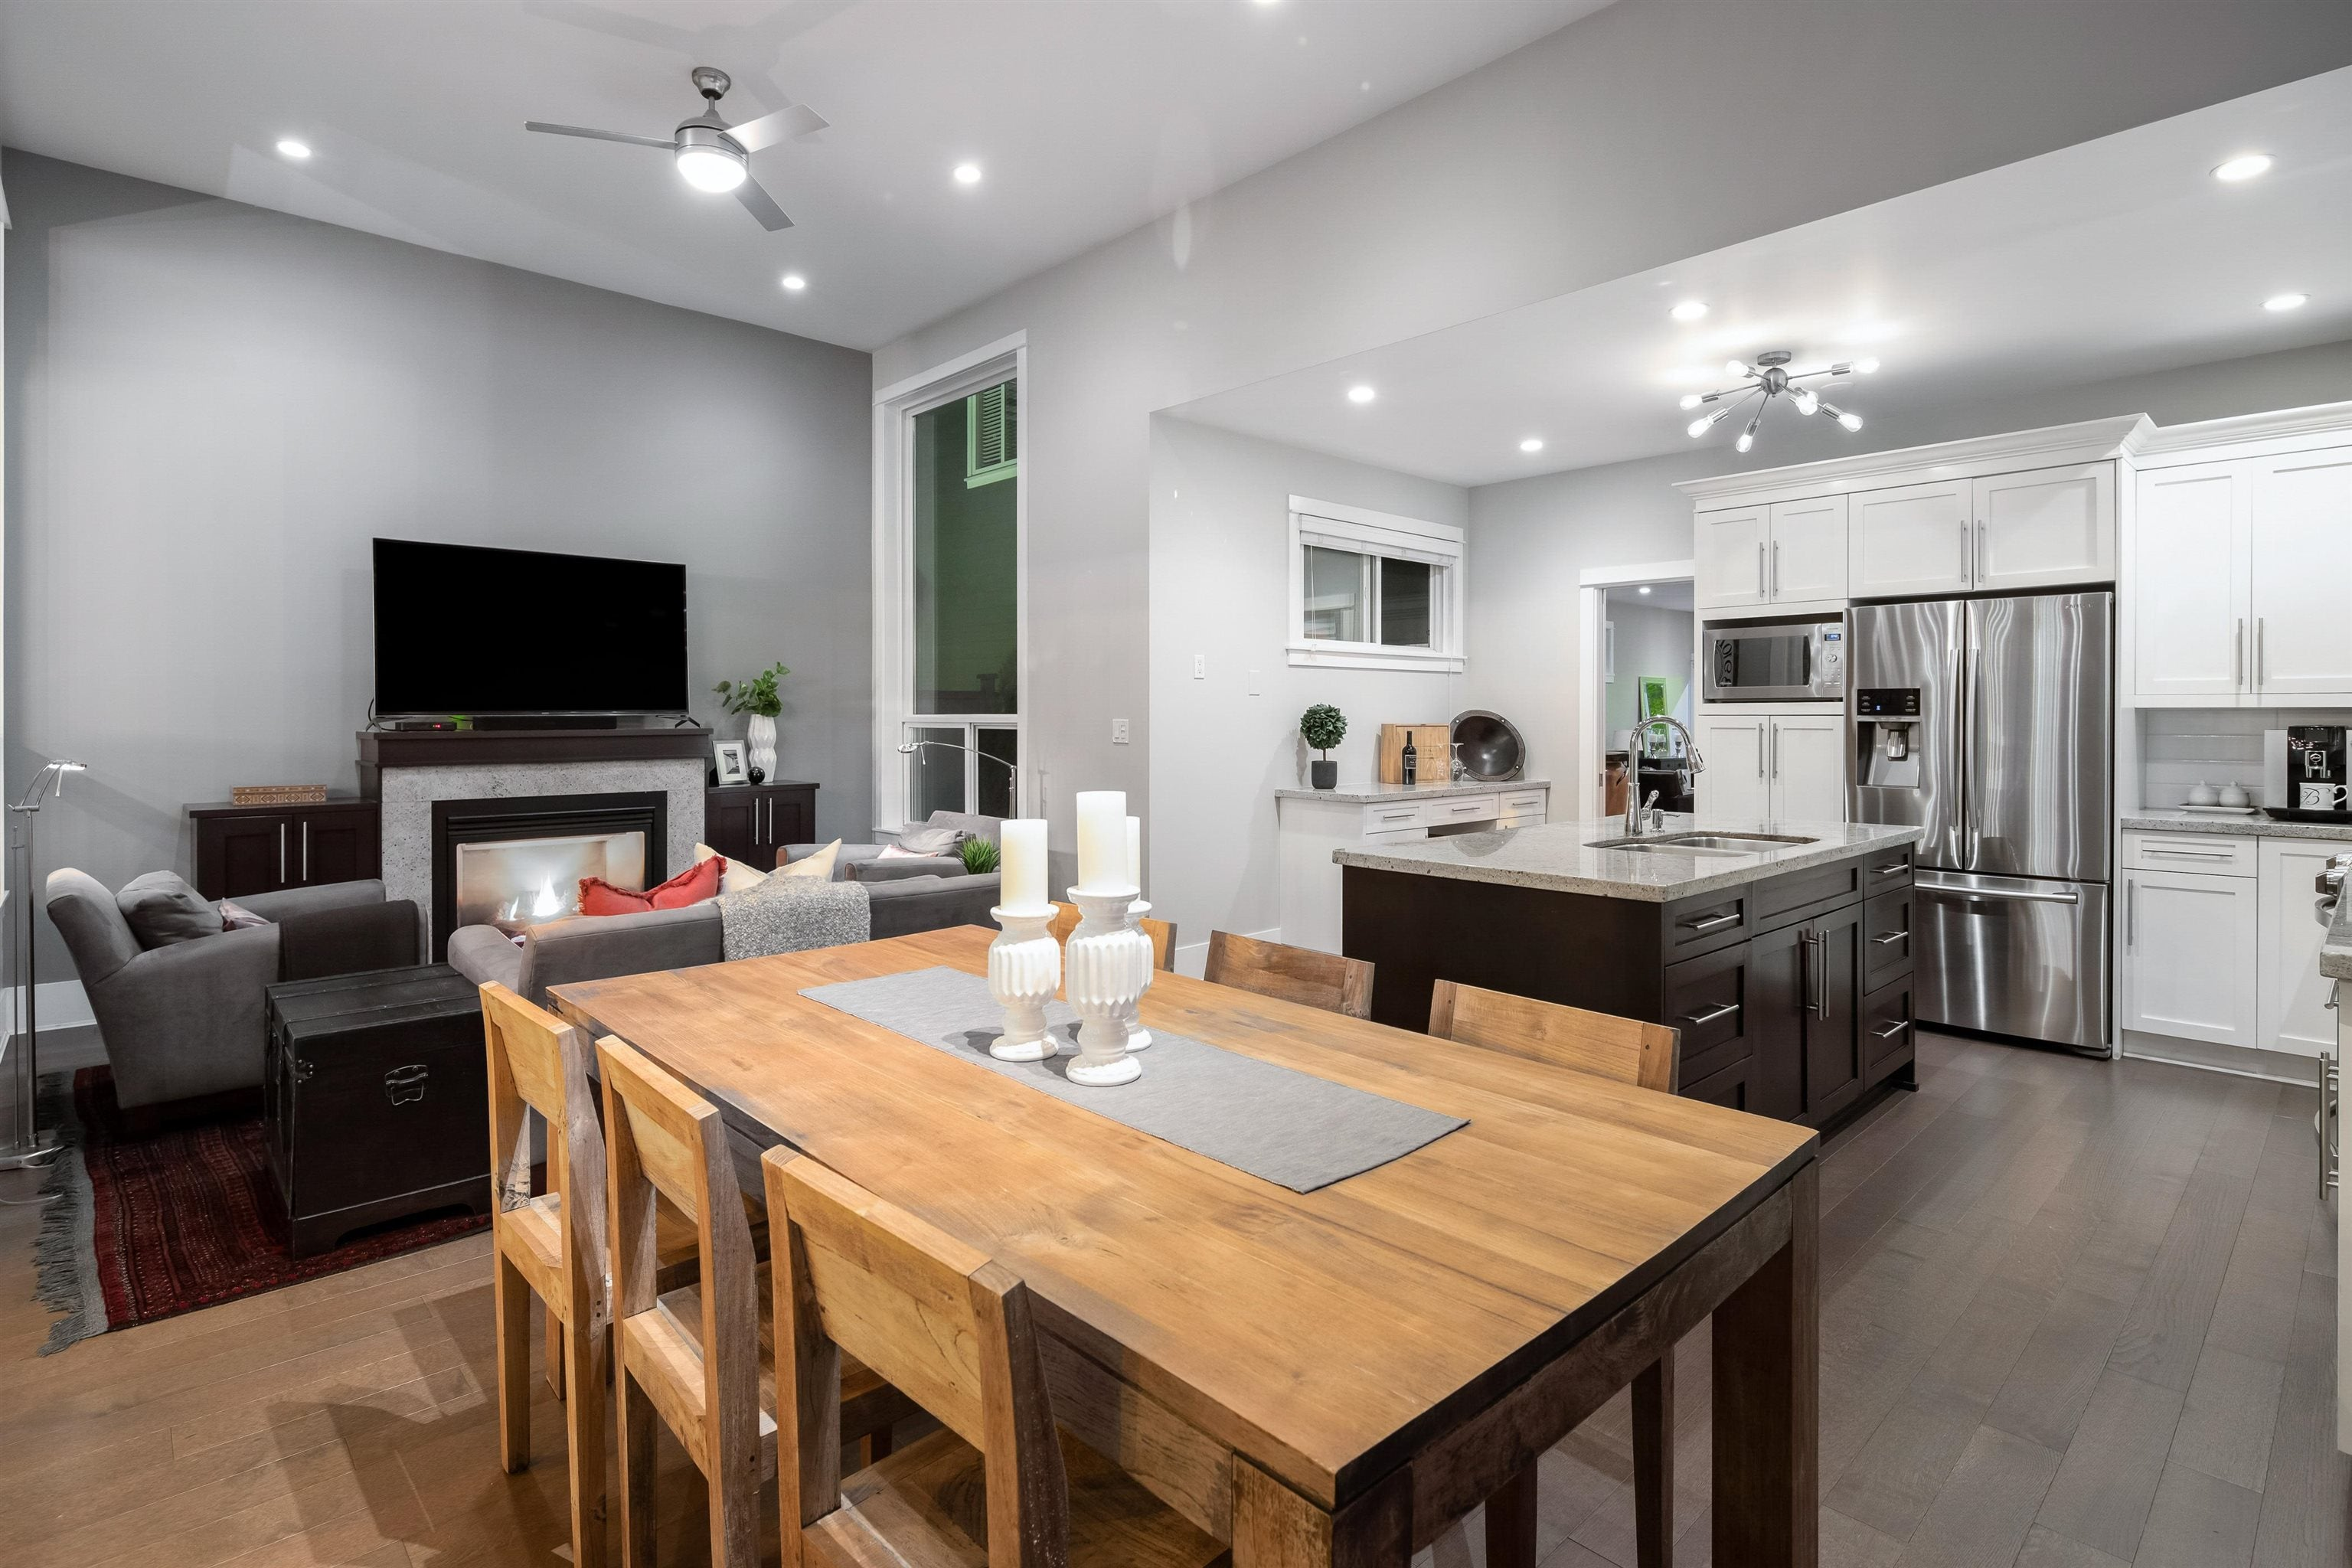 2258 WINDRIDGE DRIVE - Seymour NV House/Single Family for sale, 5 Bedrooms (R2617156) - #16